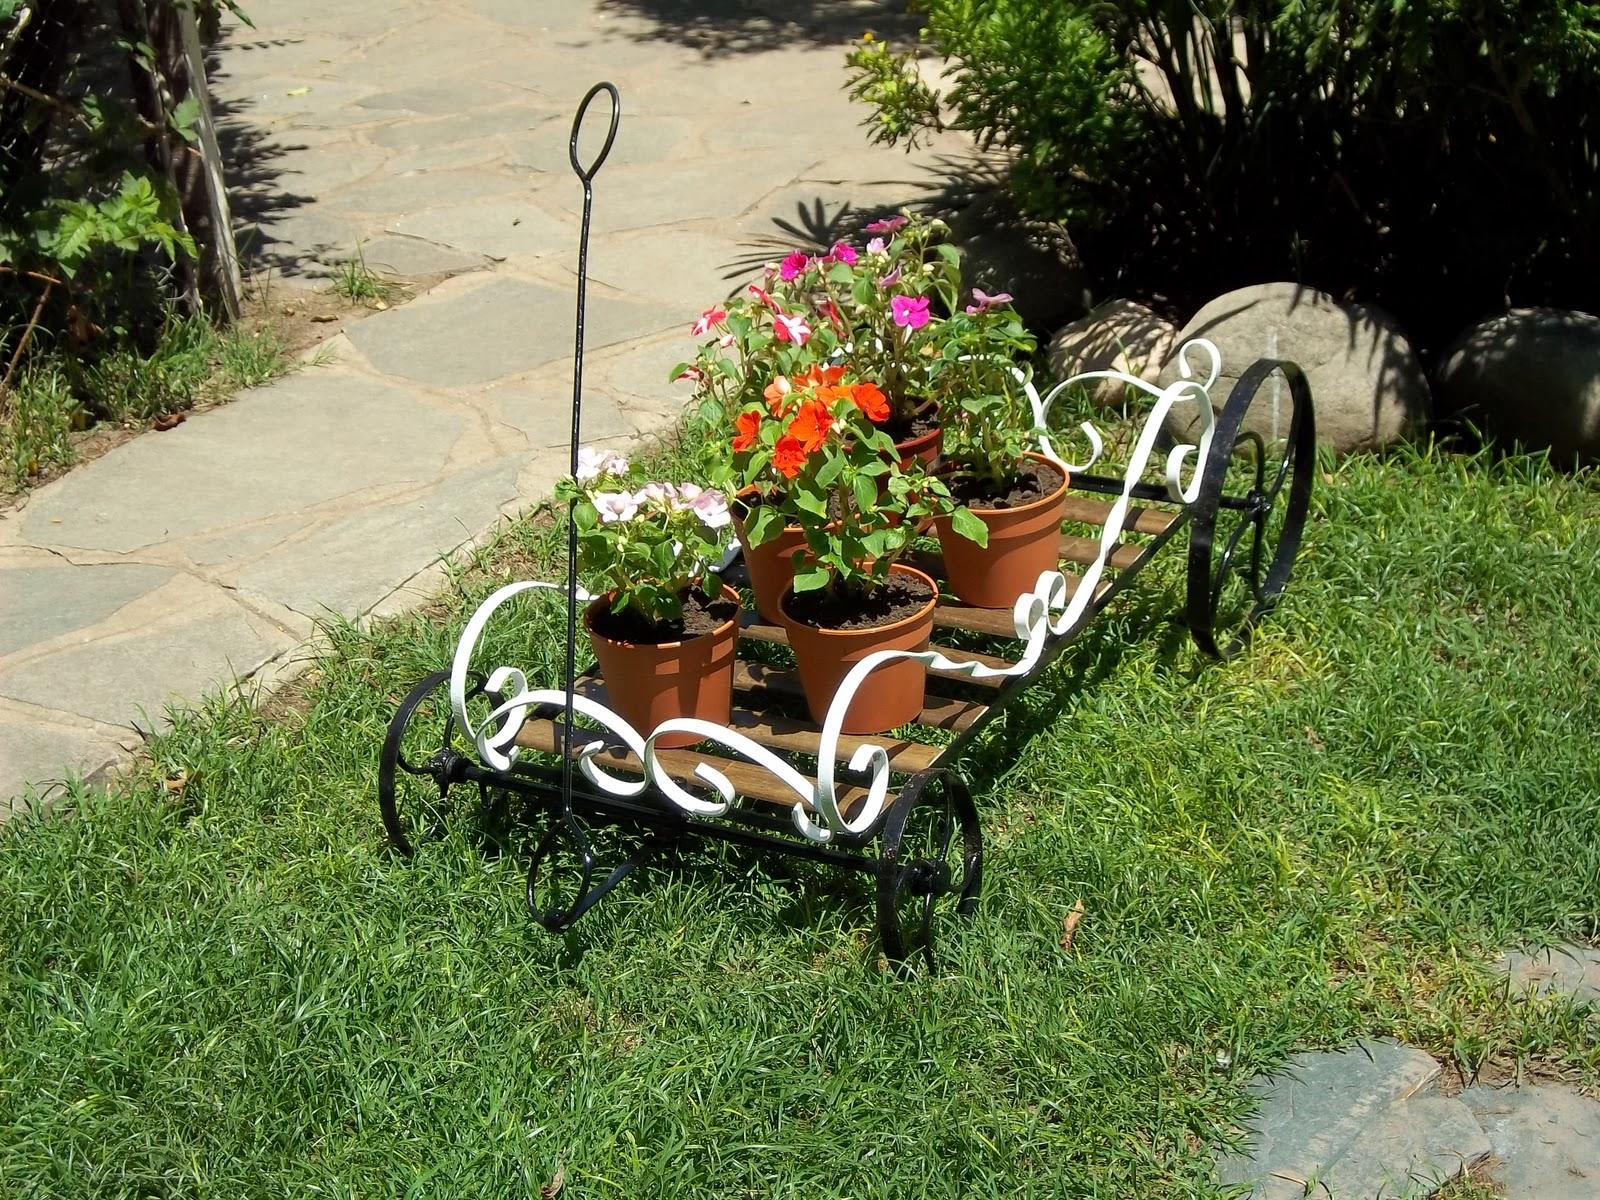 Herreria artistica articulos de jardin for Accesorios de jardin